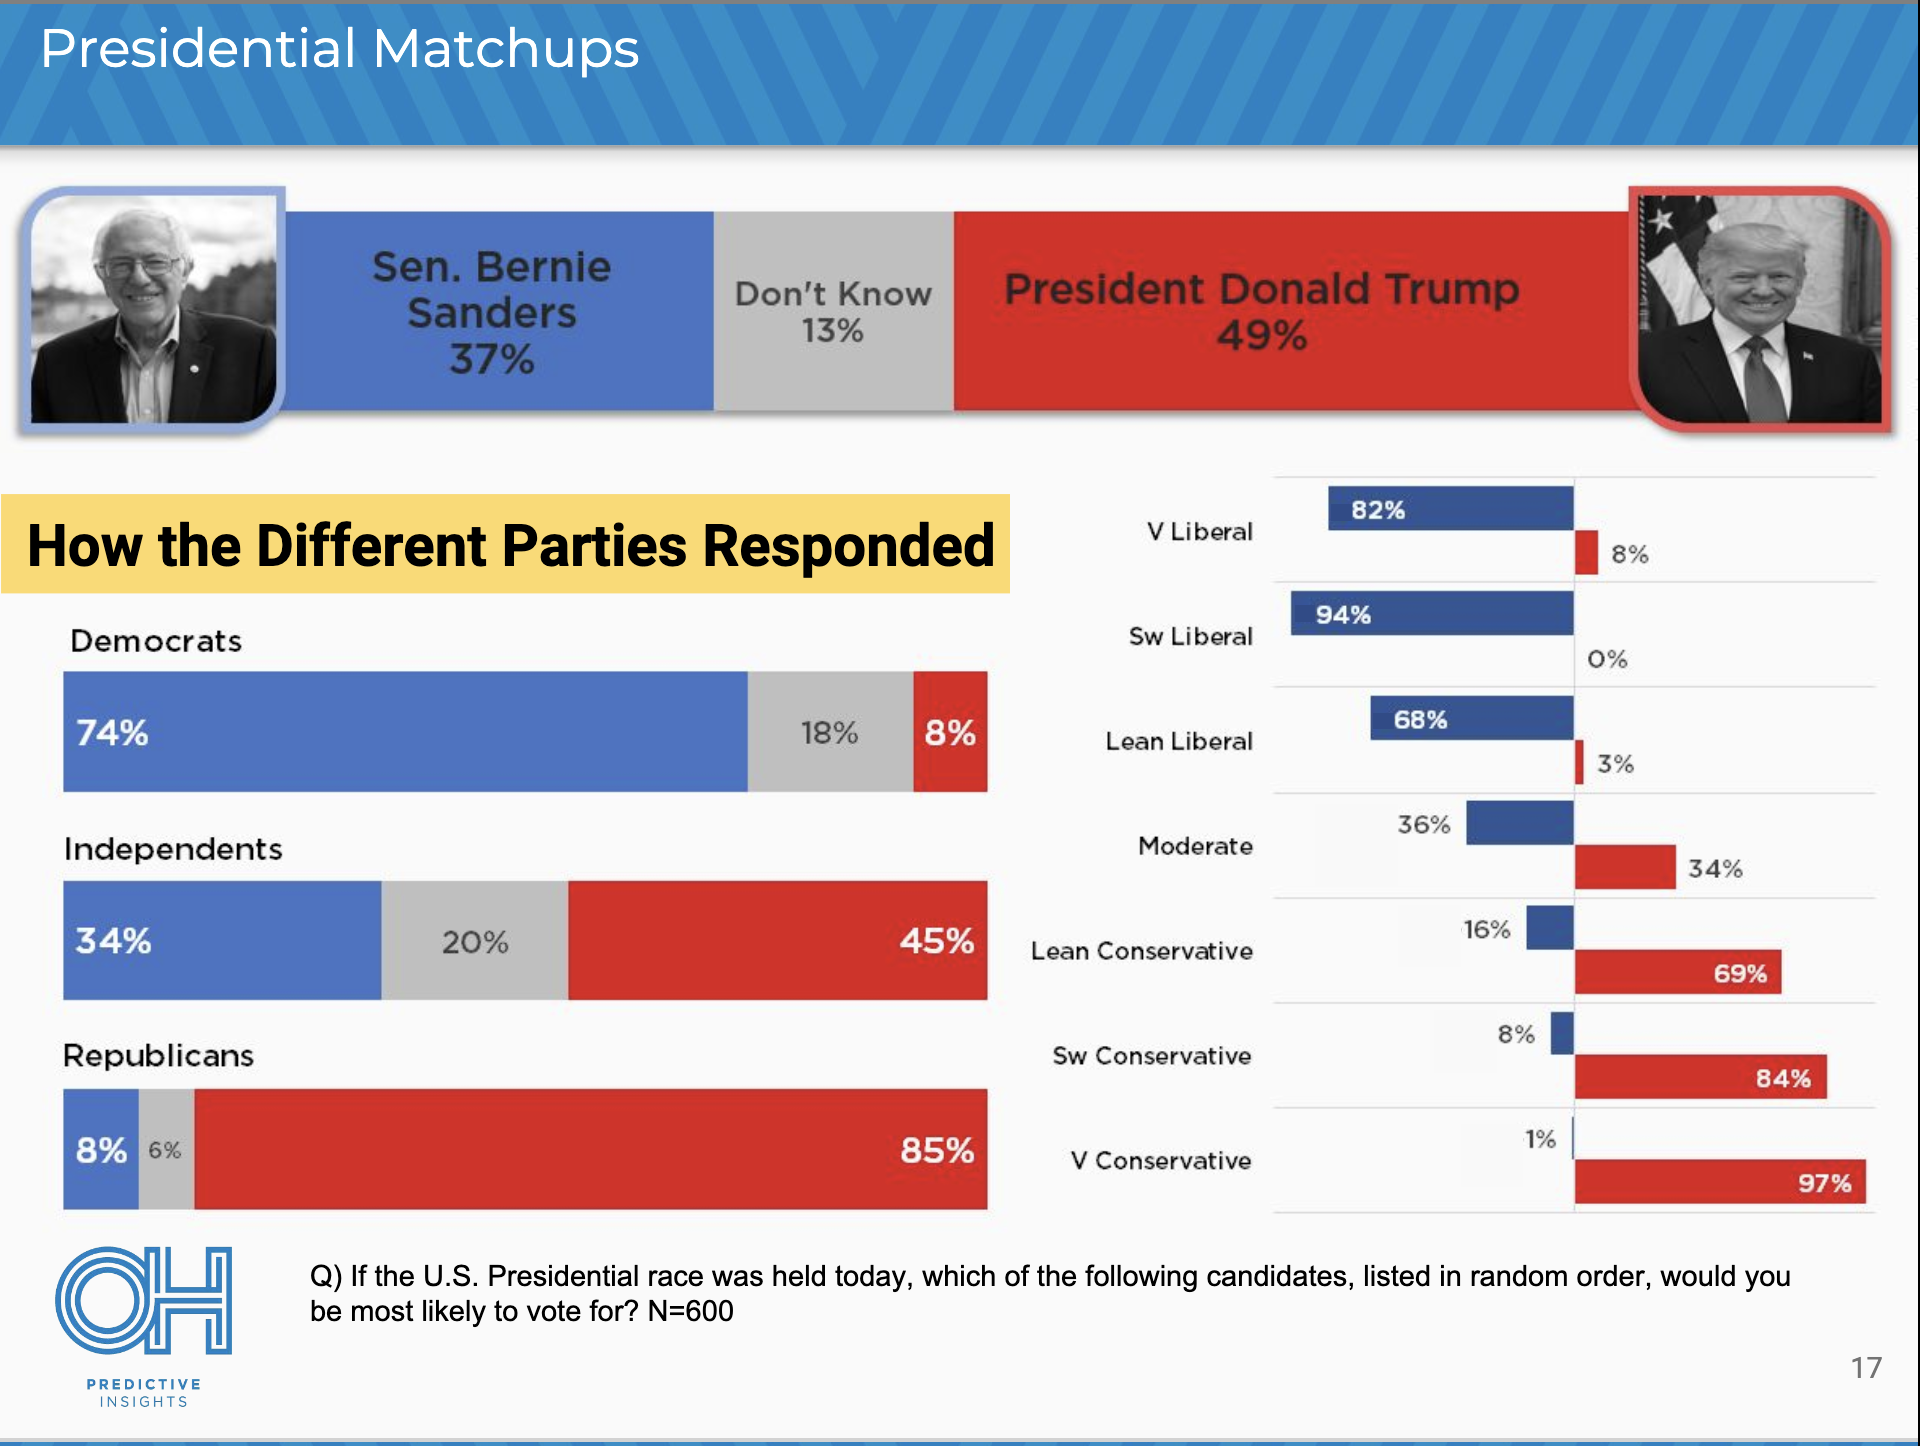 Screen-Shot-2019-05-07-at-8.36.21-AM New 2020 Poll Sends Left & Right Into A Tizzy - Social Media Explodes Donald Trump Election 2020 Politics Top Stories